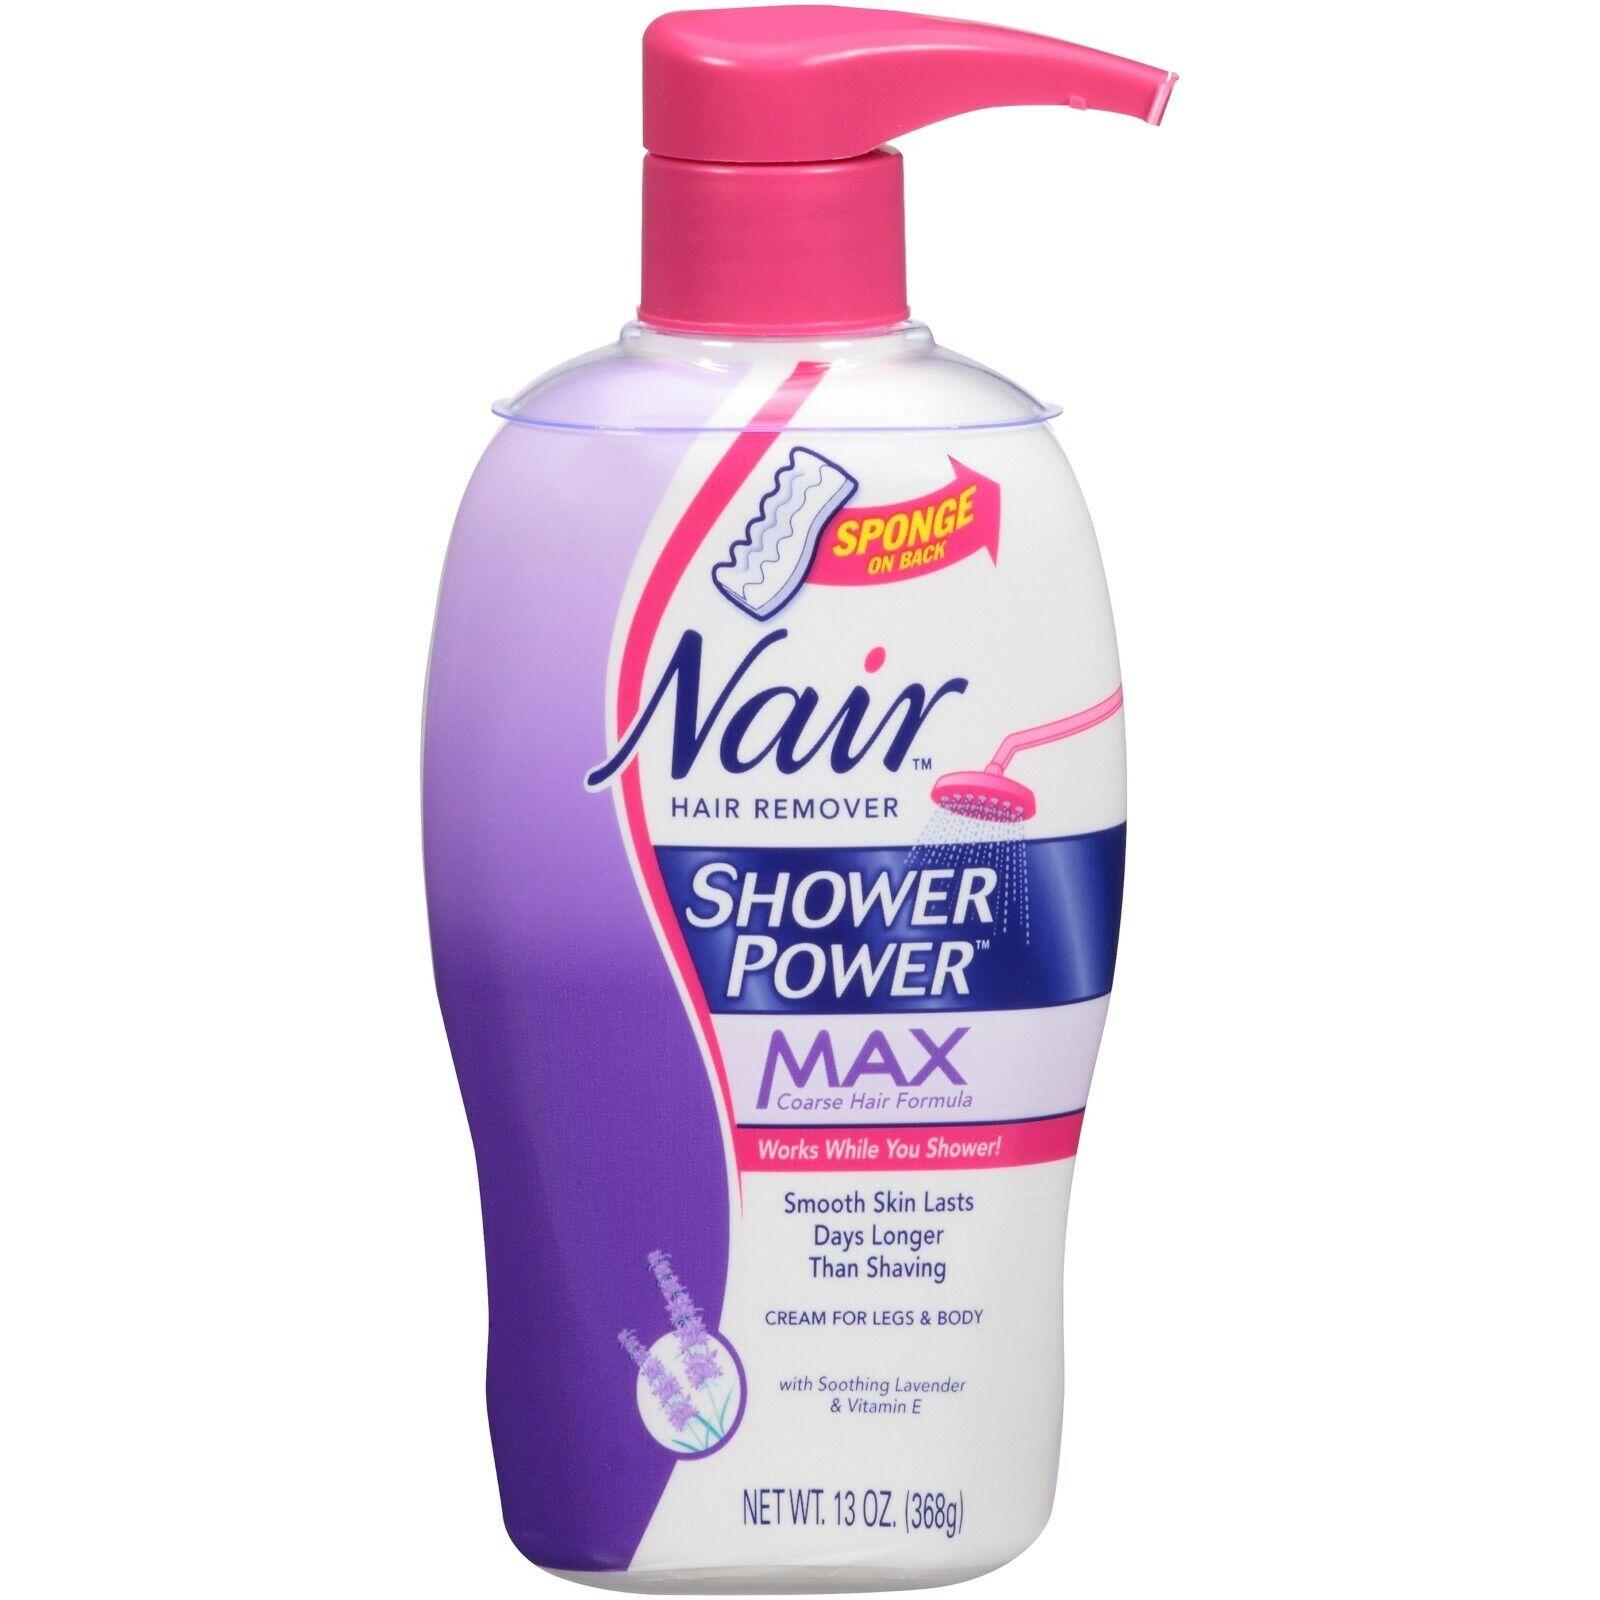 Nair Hair Remover Shower Power Max Legs Body Cream Sponge Lavender Vita E 13 oz Hair Removal Creams & Sprays